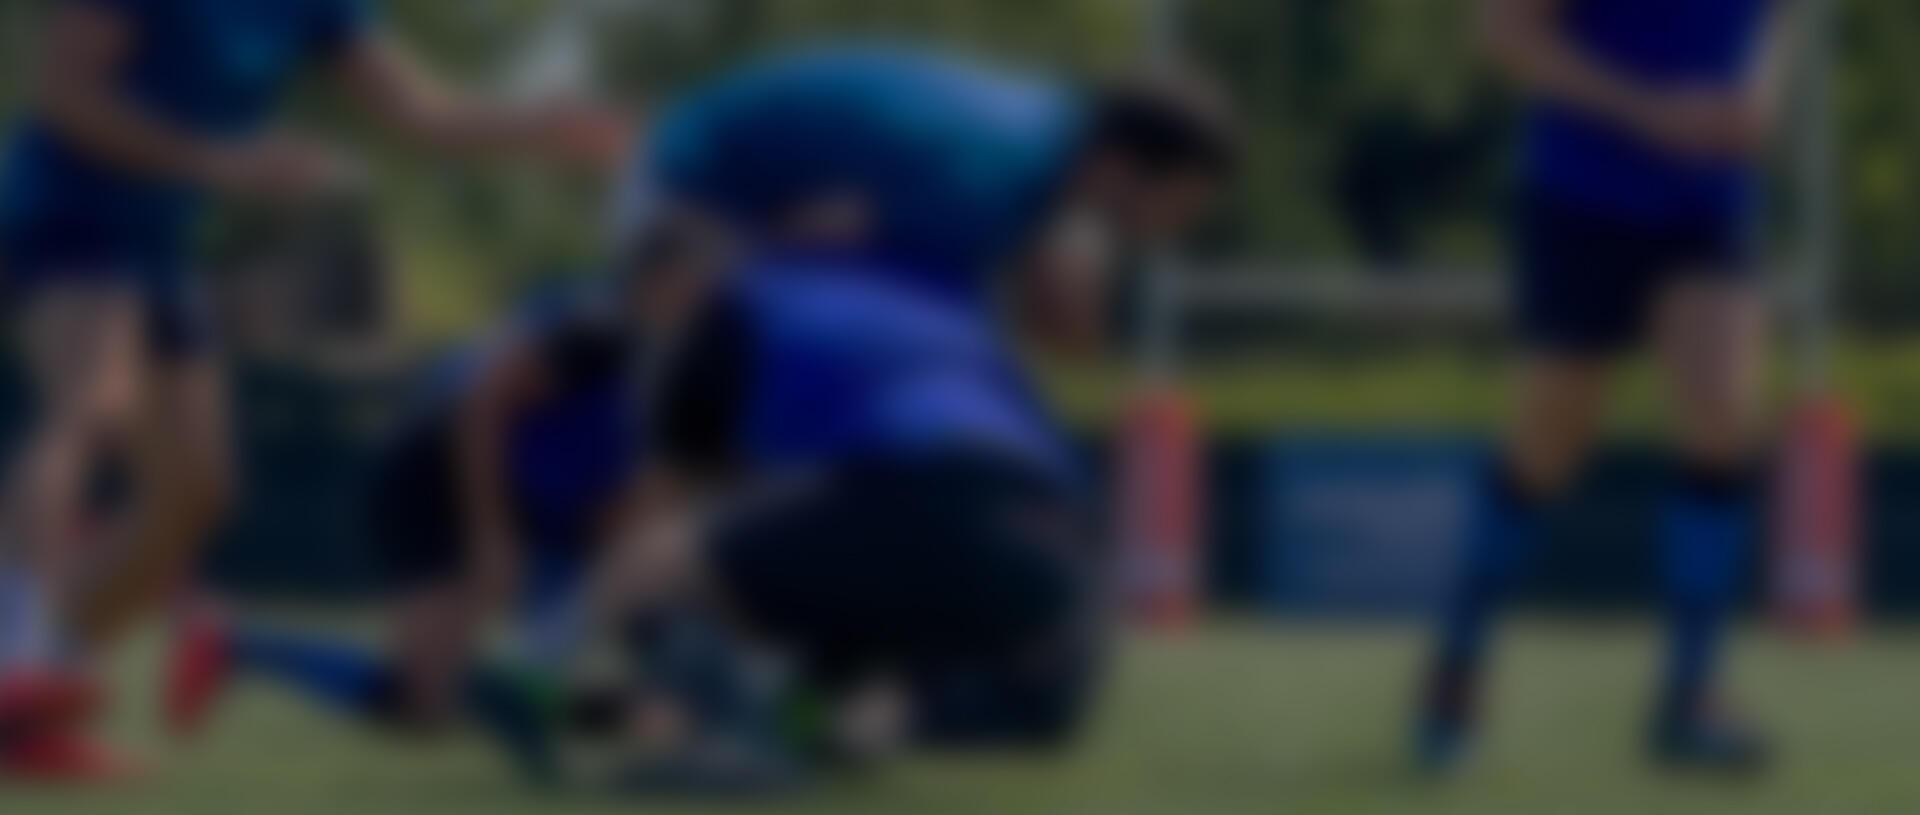 Offload la marque rugby